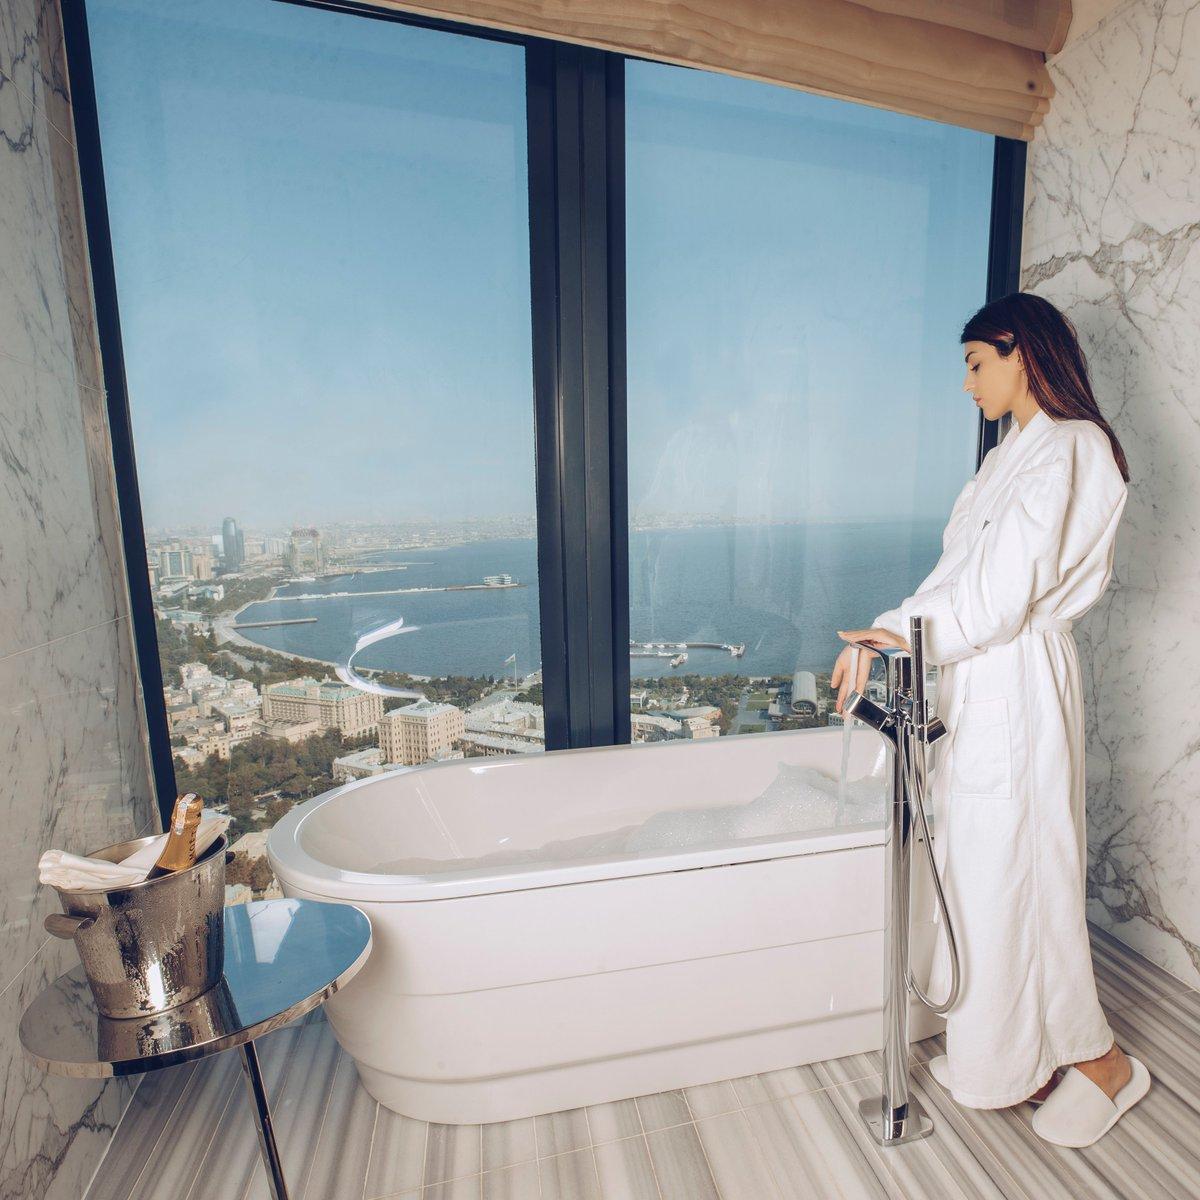 Bath with the mesmerizing view after a long day exploring Baku city.  #fairmontbaku #fairmontmoments #flametowers #baku #azerbaijan #accorhotels #luxuryhotels #besthotels #luxurytraveller #luxurytravellers #bath #bathwiththeview https://t.co/KOqhuTHBmf